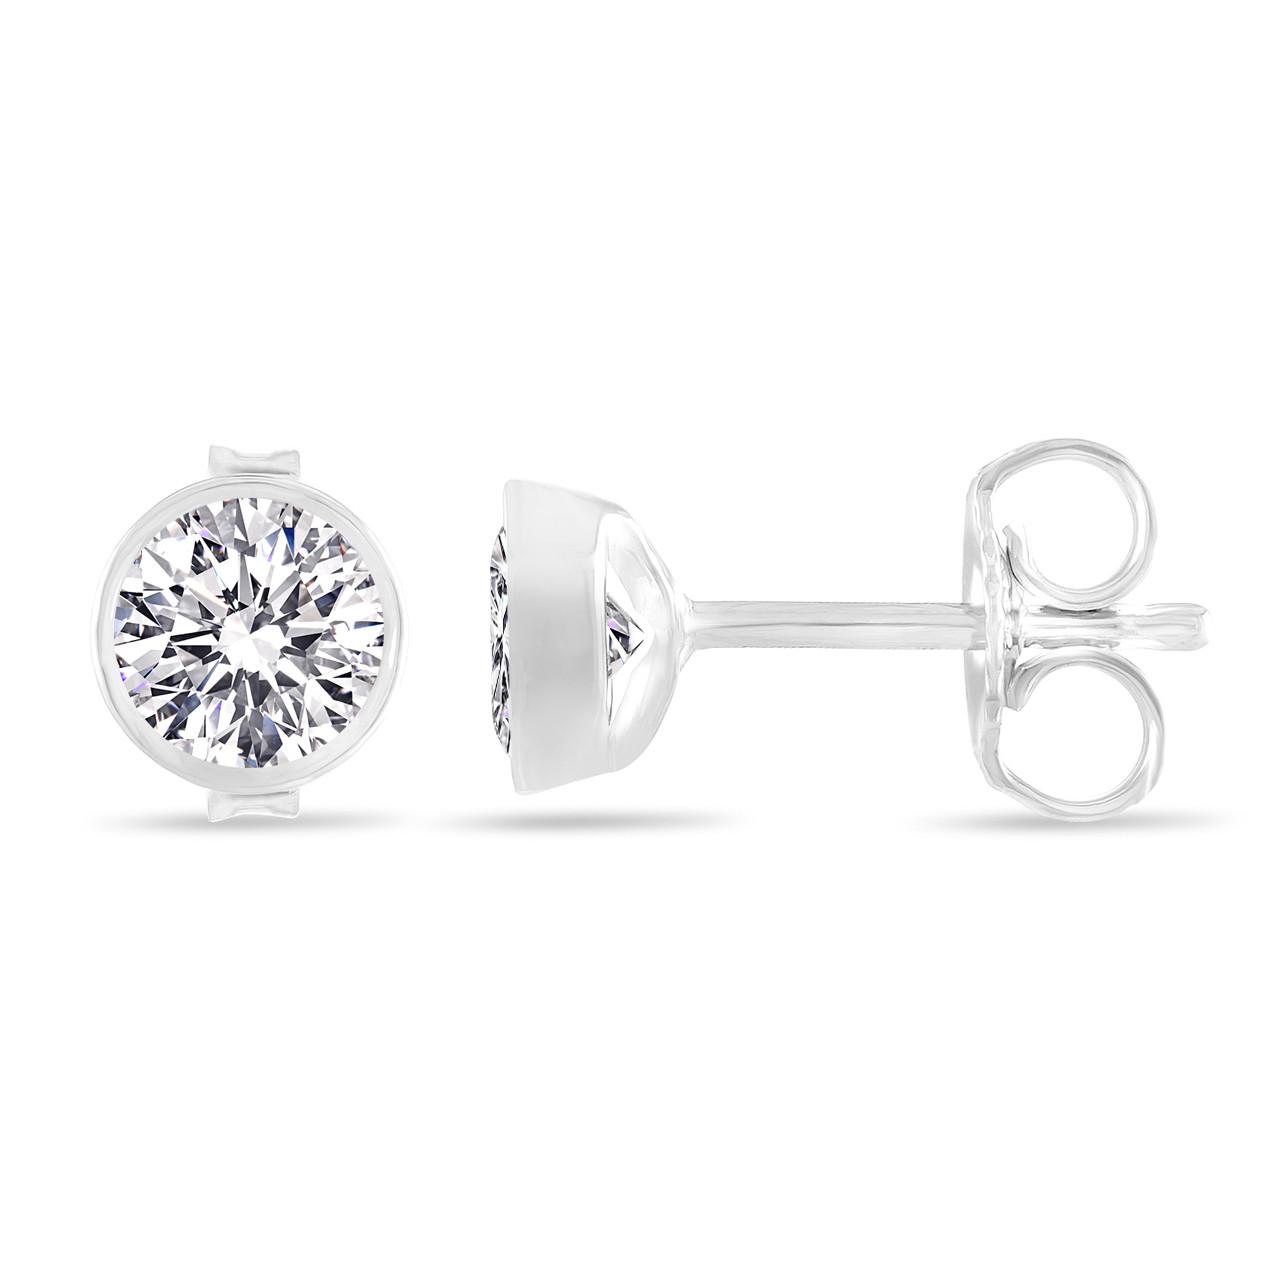 Platinum D Color Internally Flawless Diamond Stud Earrings